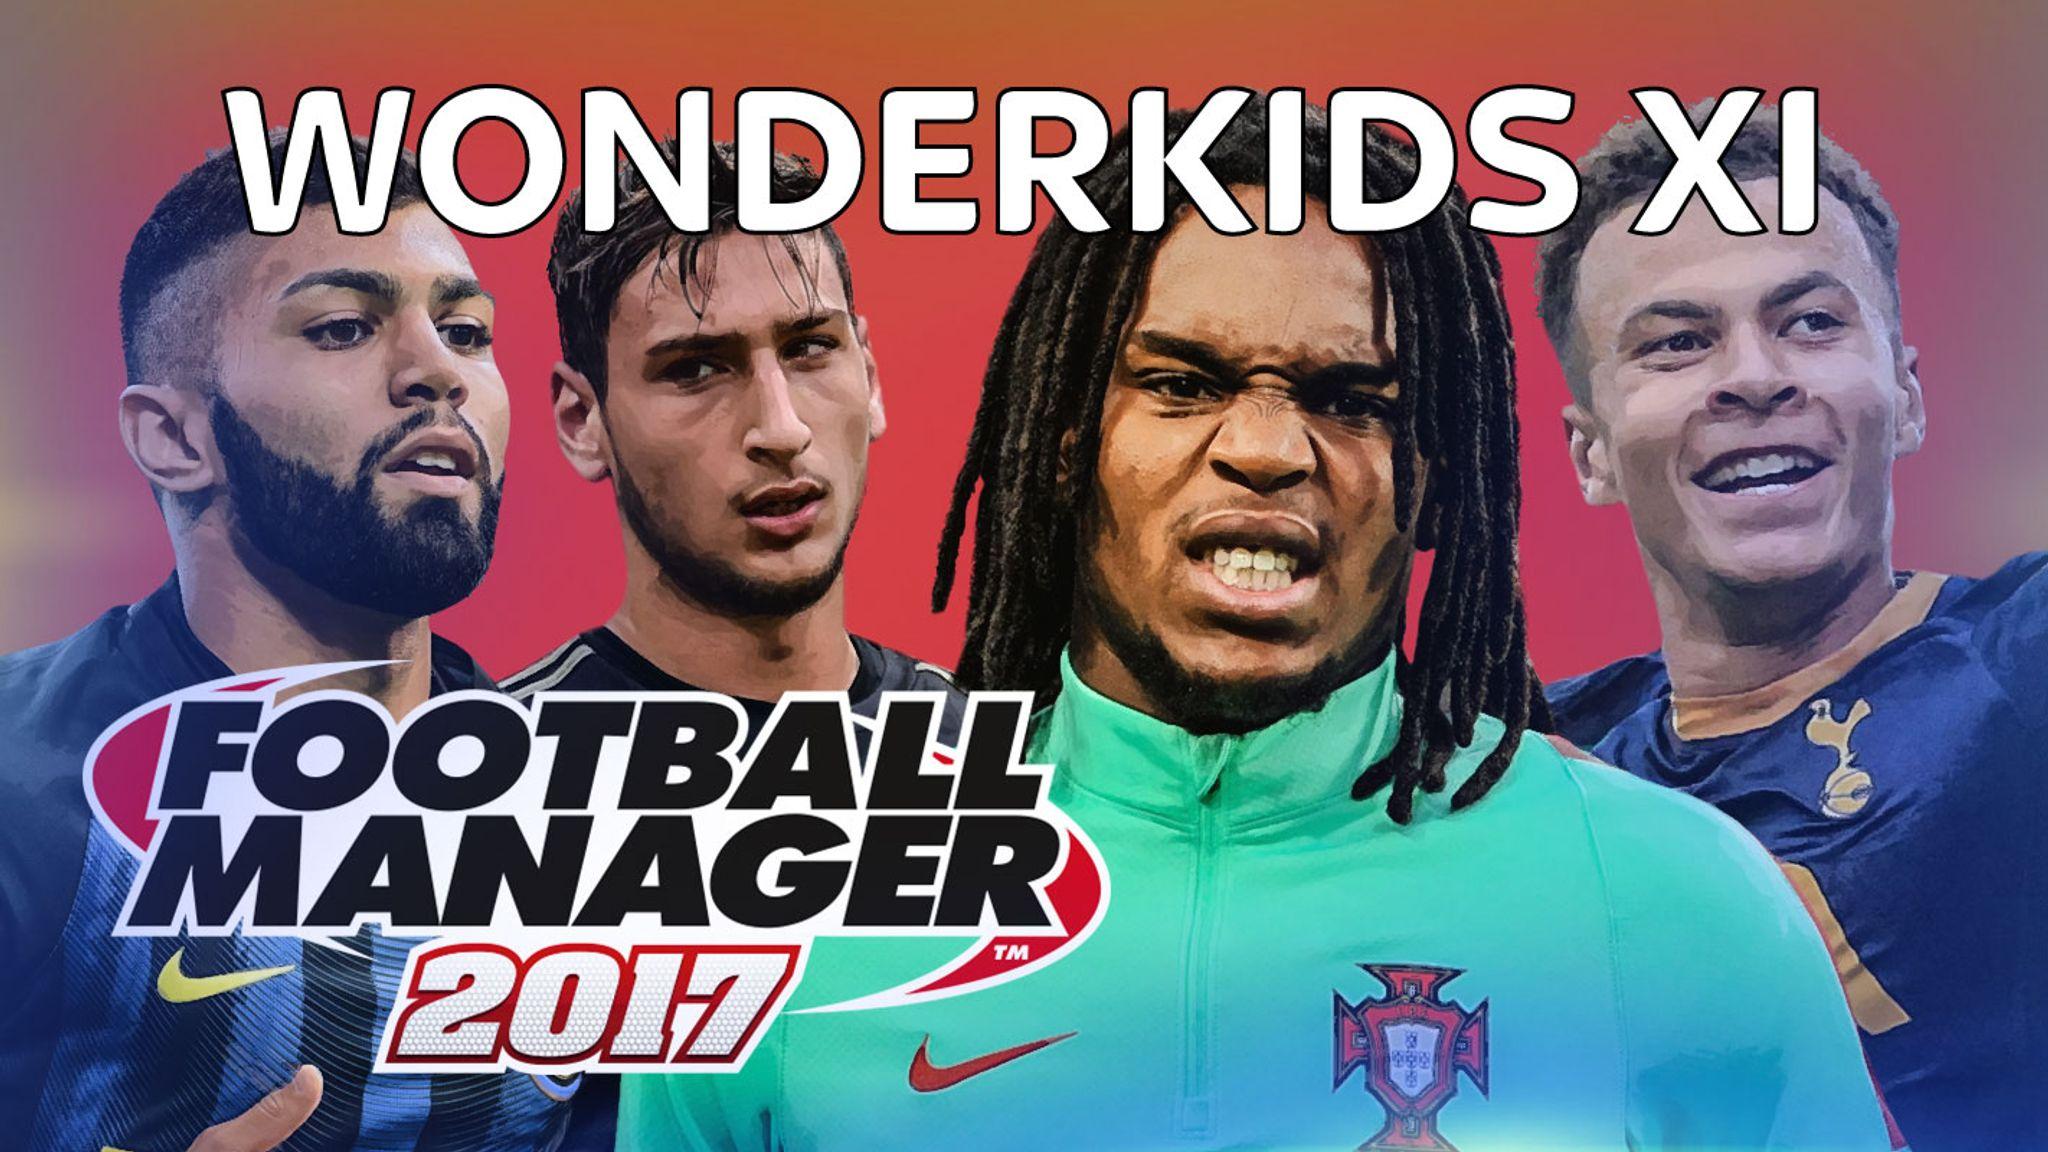 Football Manager 2017 wonderkids revealed | Football News